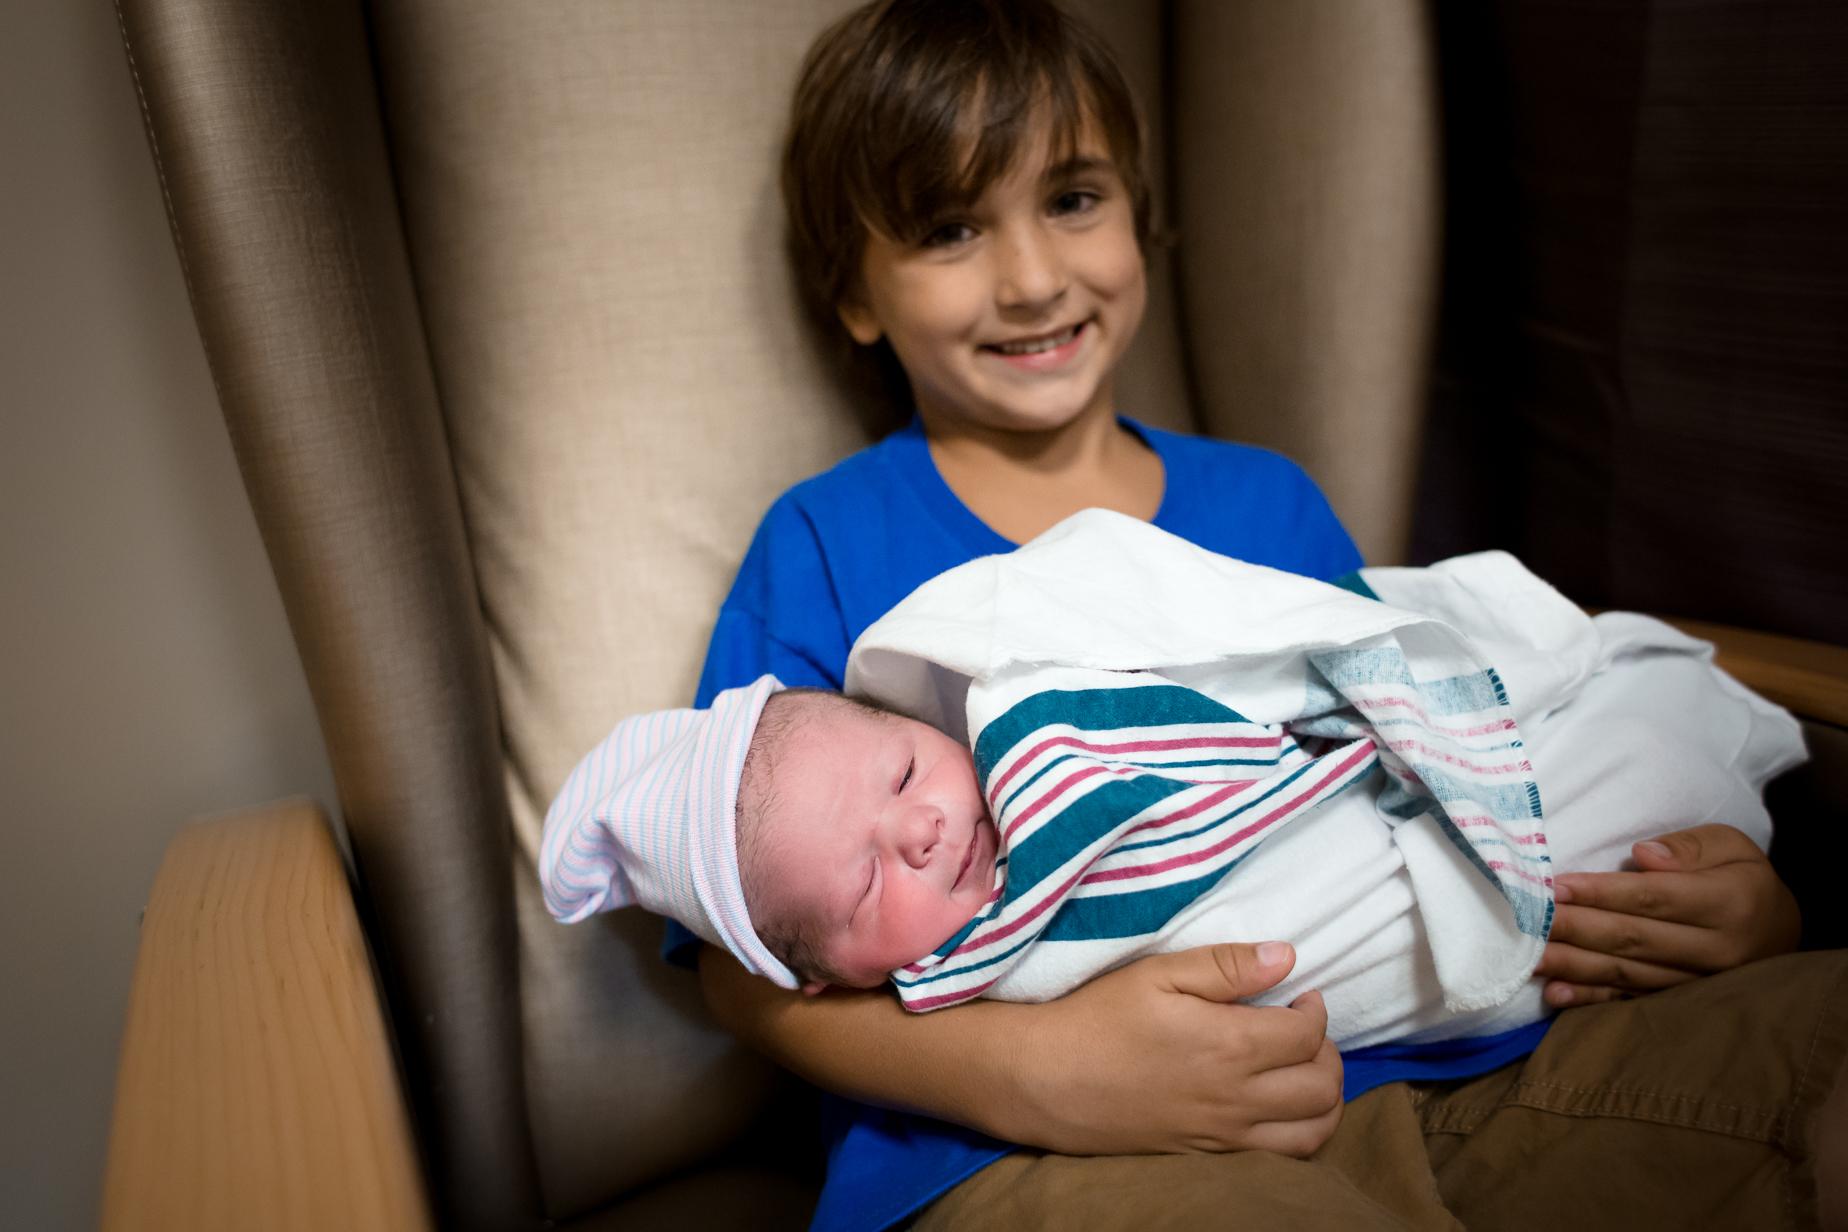 west-boca-hospital-gentle-c-section-epidural-vbac-home-birth-mary-harris-palms-birth-house-center-28.jpg